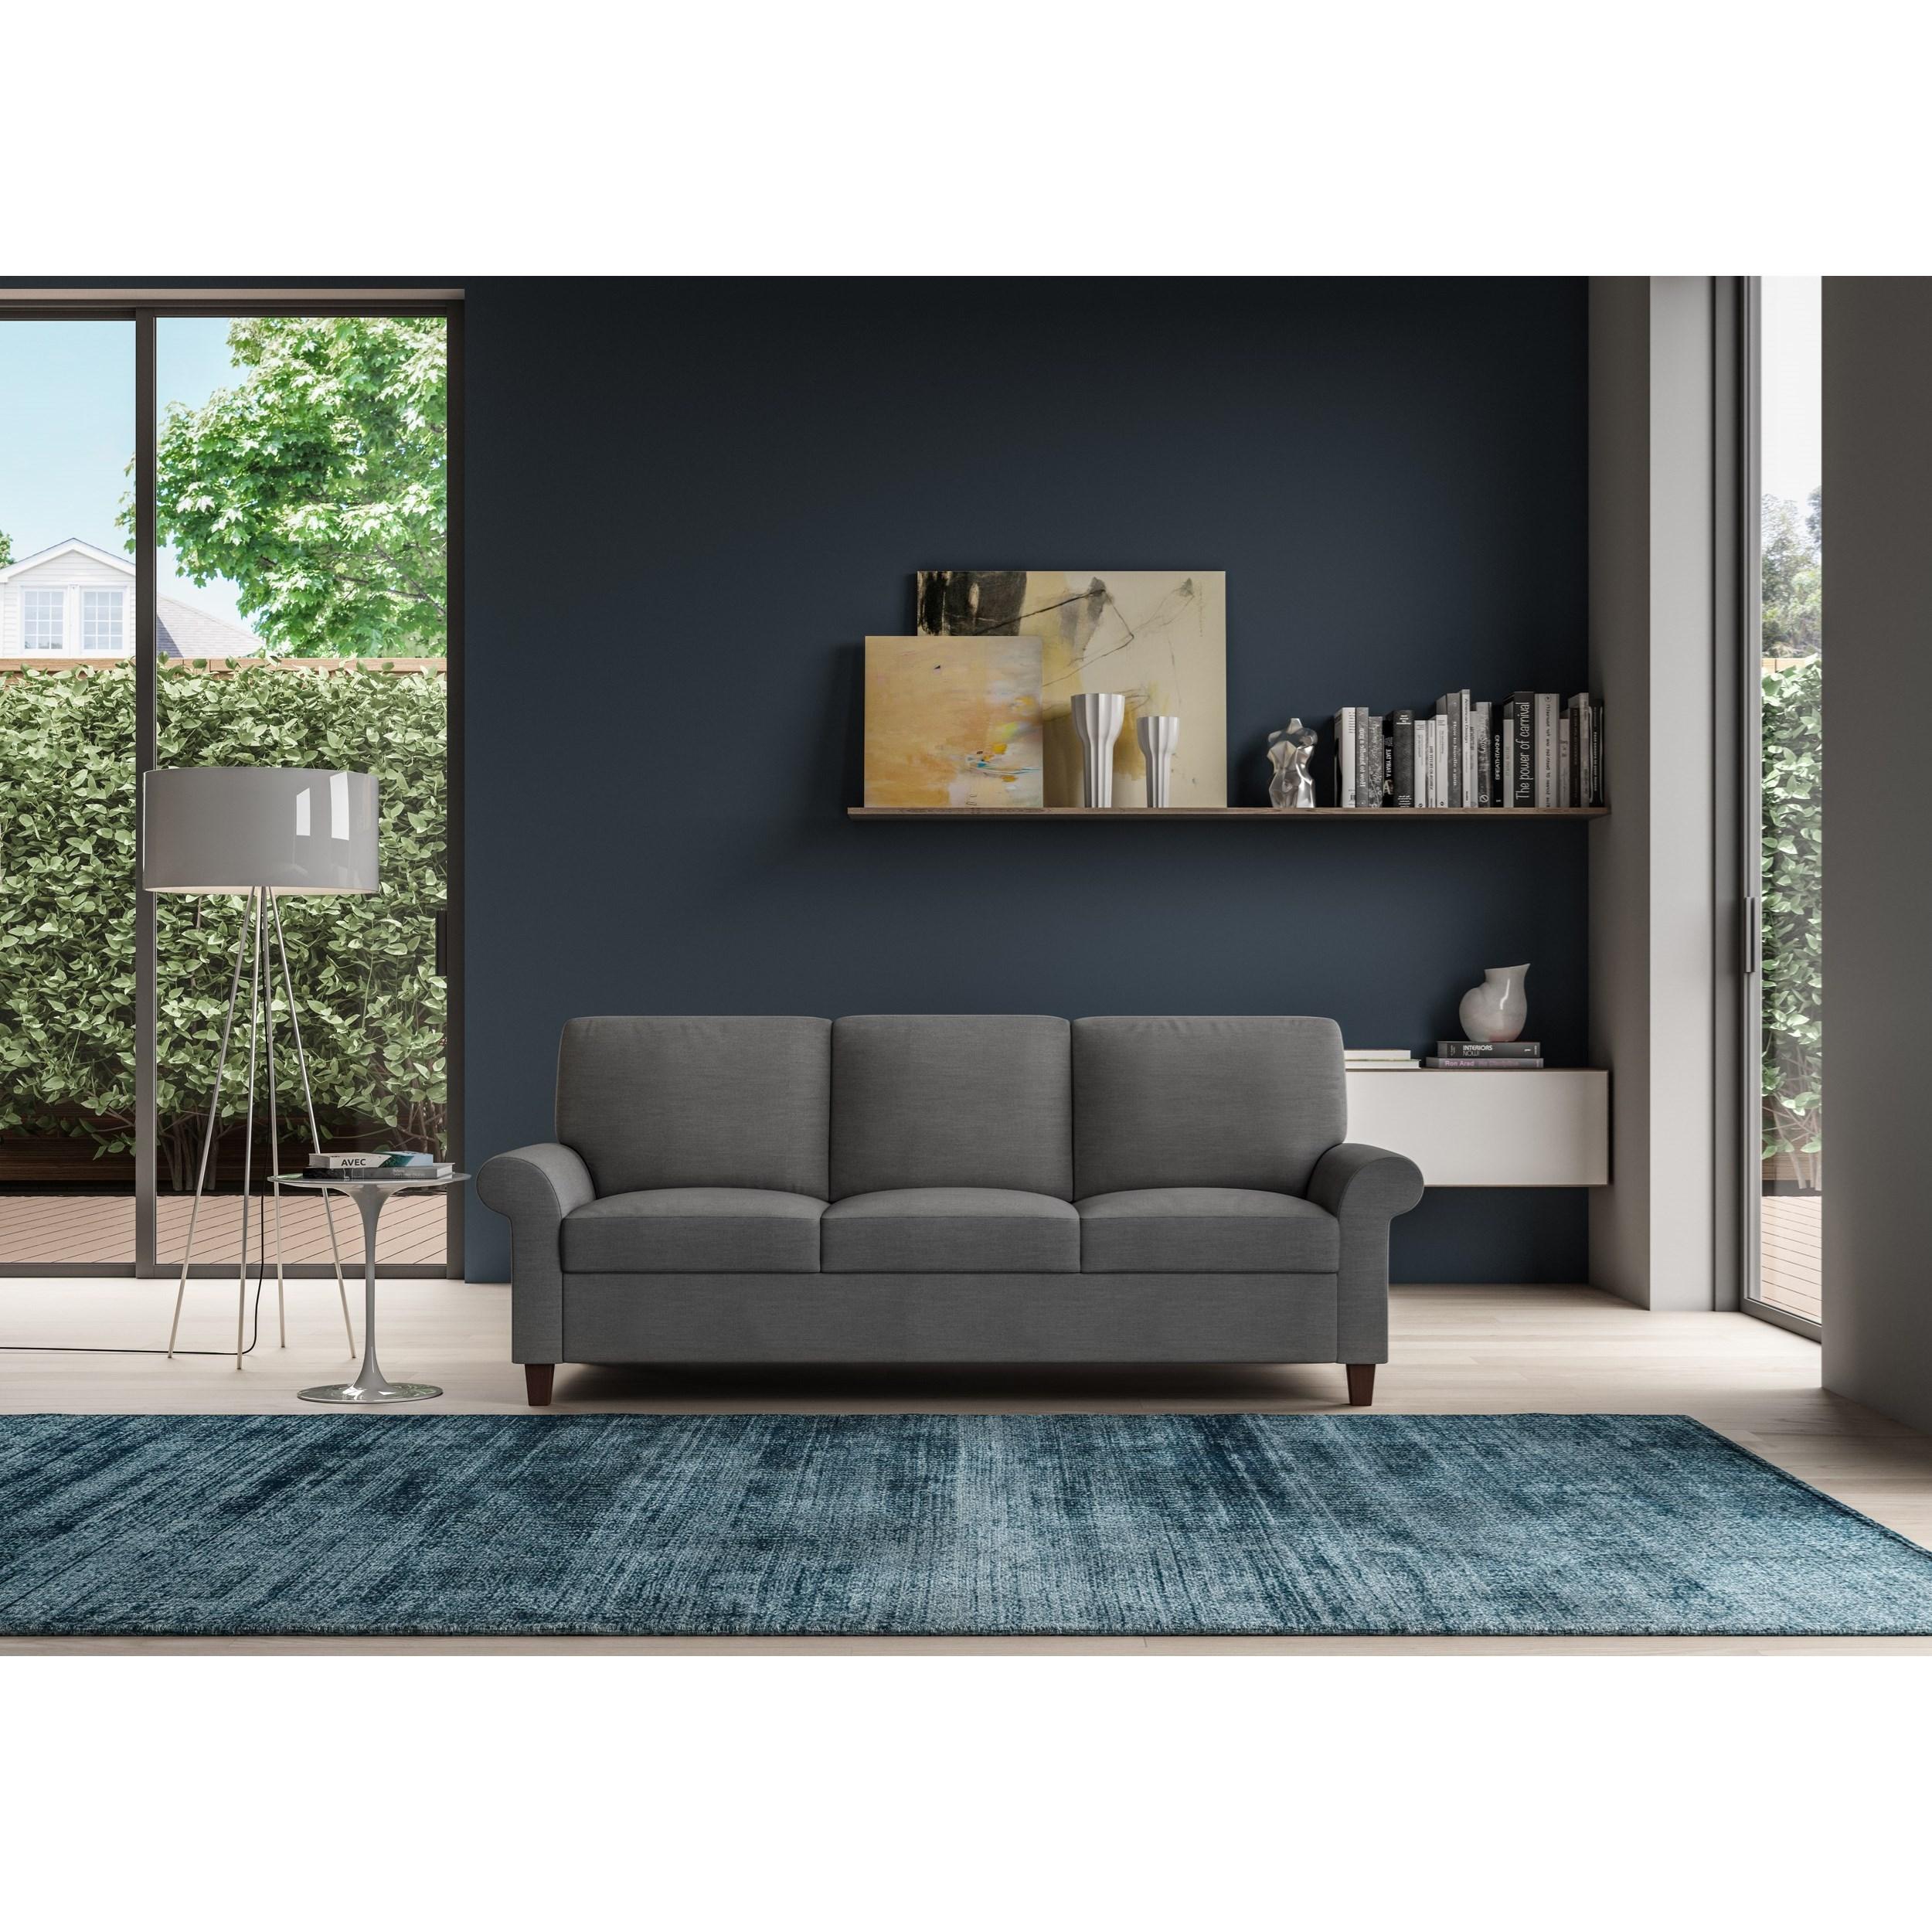 american leather gibbs king size comfort sleeper williams kay sleeper sofas. Black Bedroom Furniture Sets. Home Design Ideas